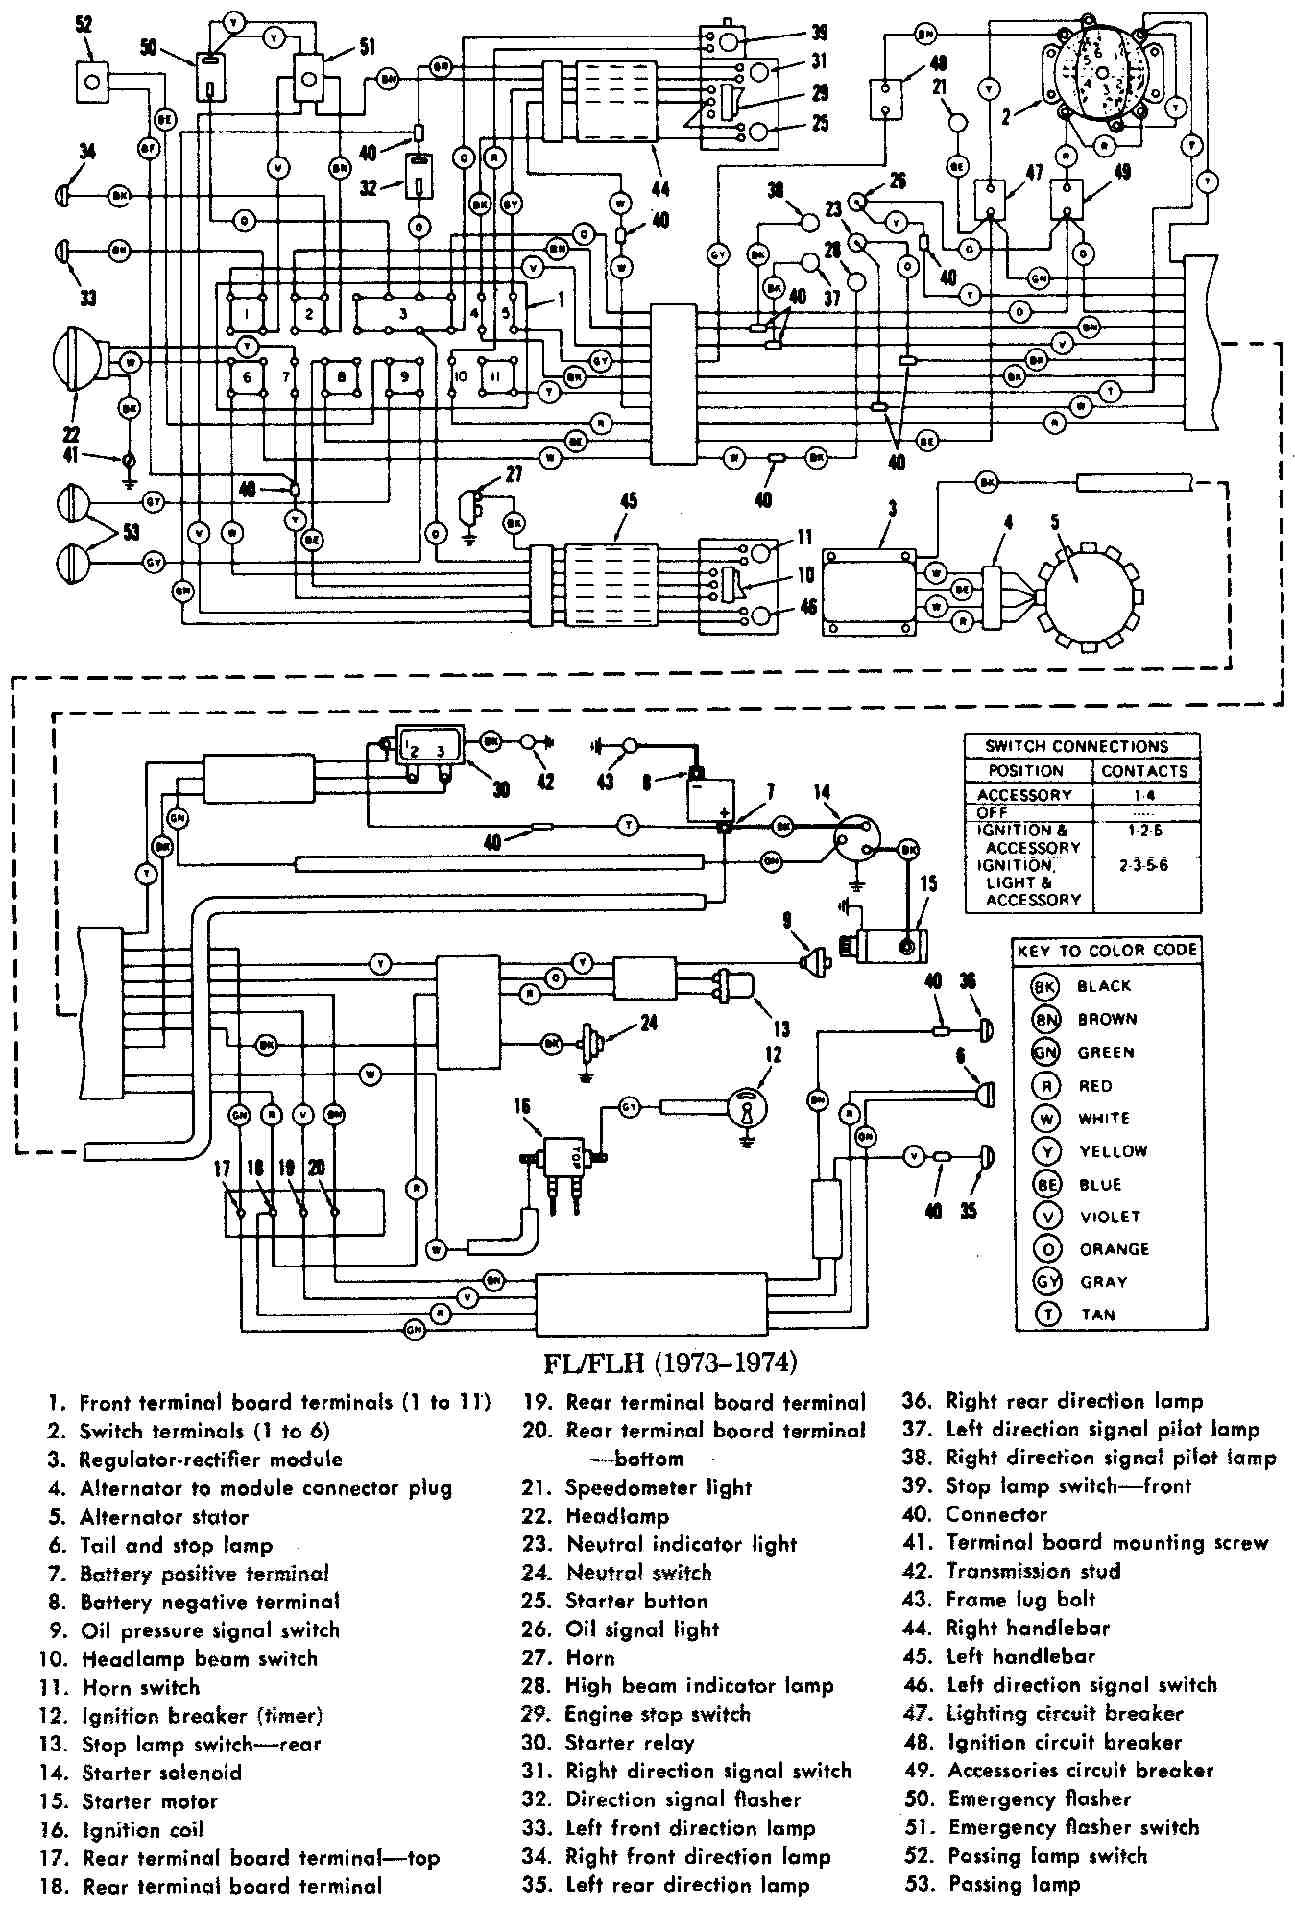 harley wiring diagram wires detailed schematics diagram harley throttle by wire diagram harley starter relay wiring [ 1295 x 1907 Pixel ]